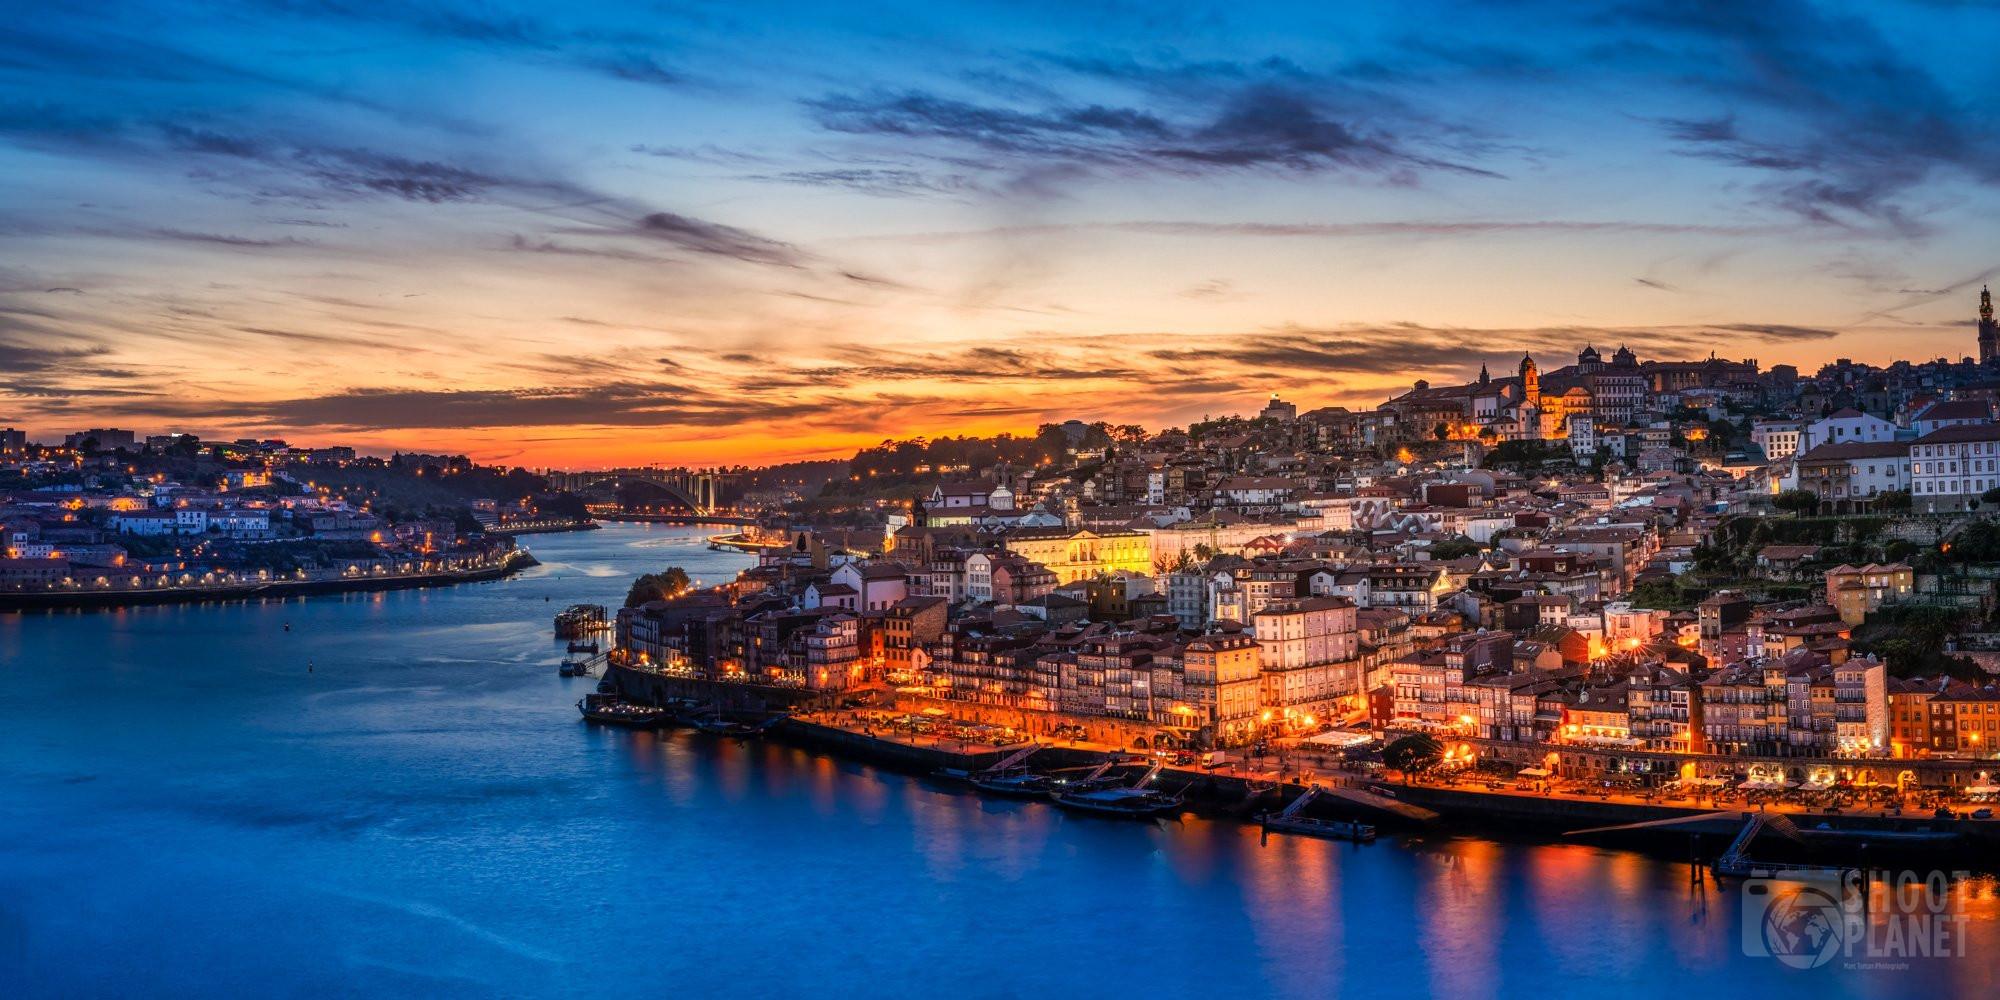 City and Douro River sunset, Porto, Portugal